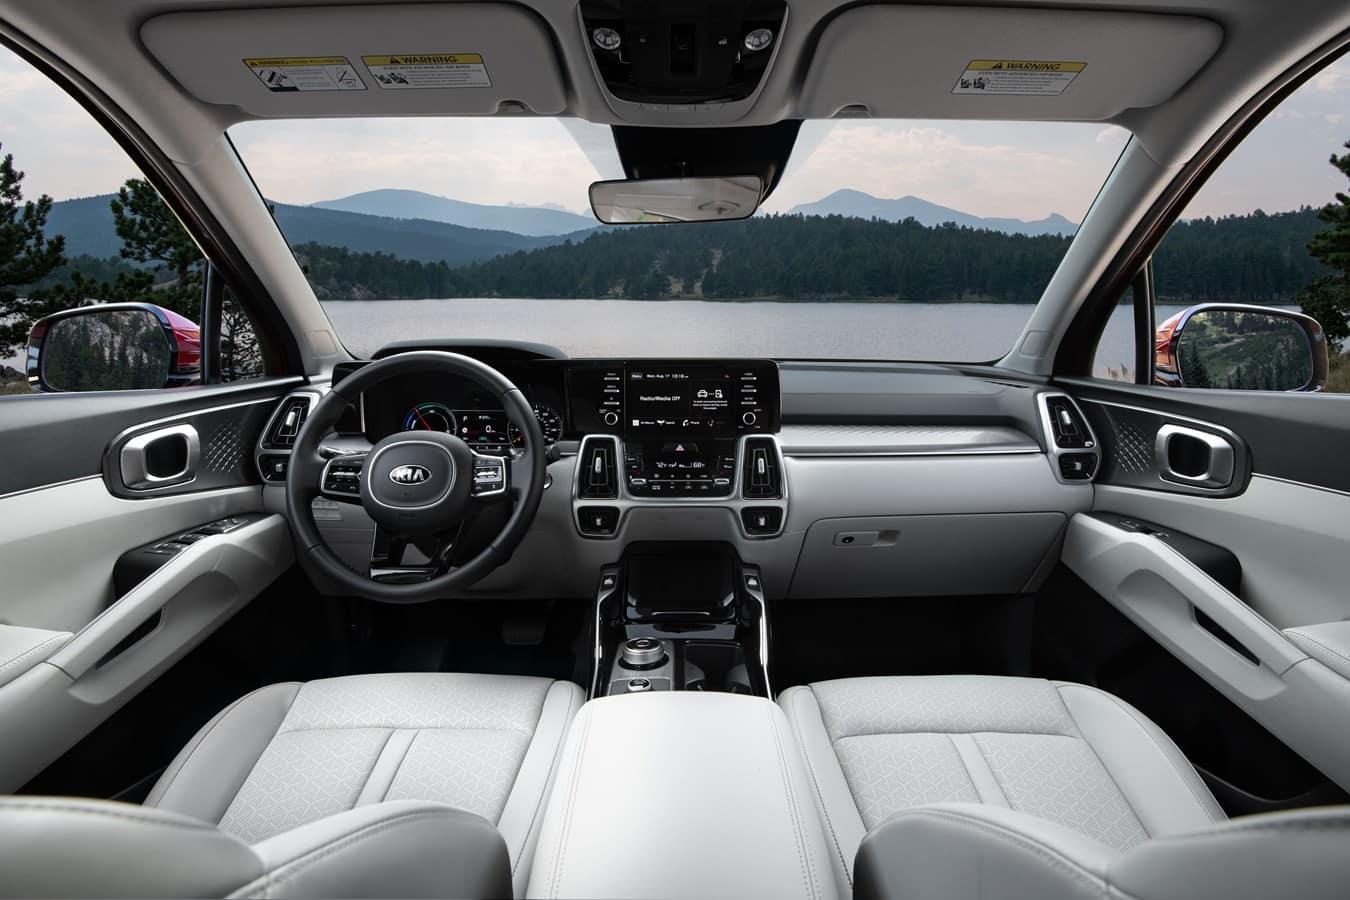 Upscale Interior of a Kia Sorento Hybrid